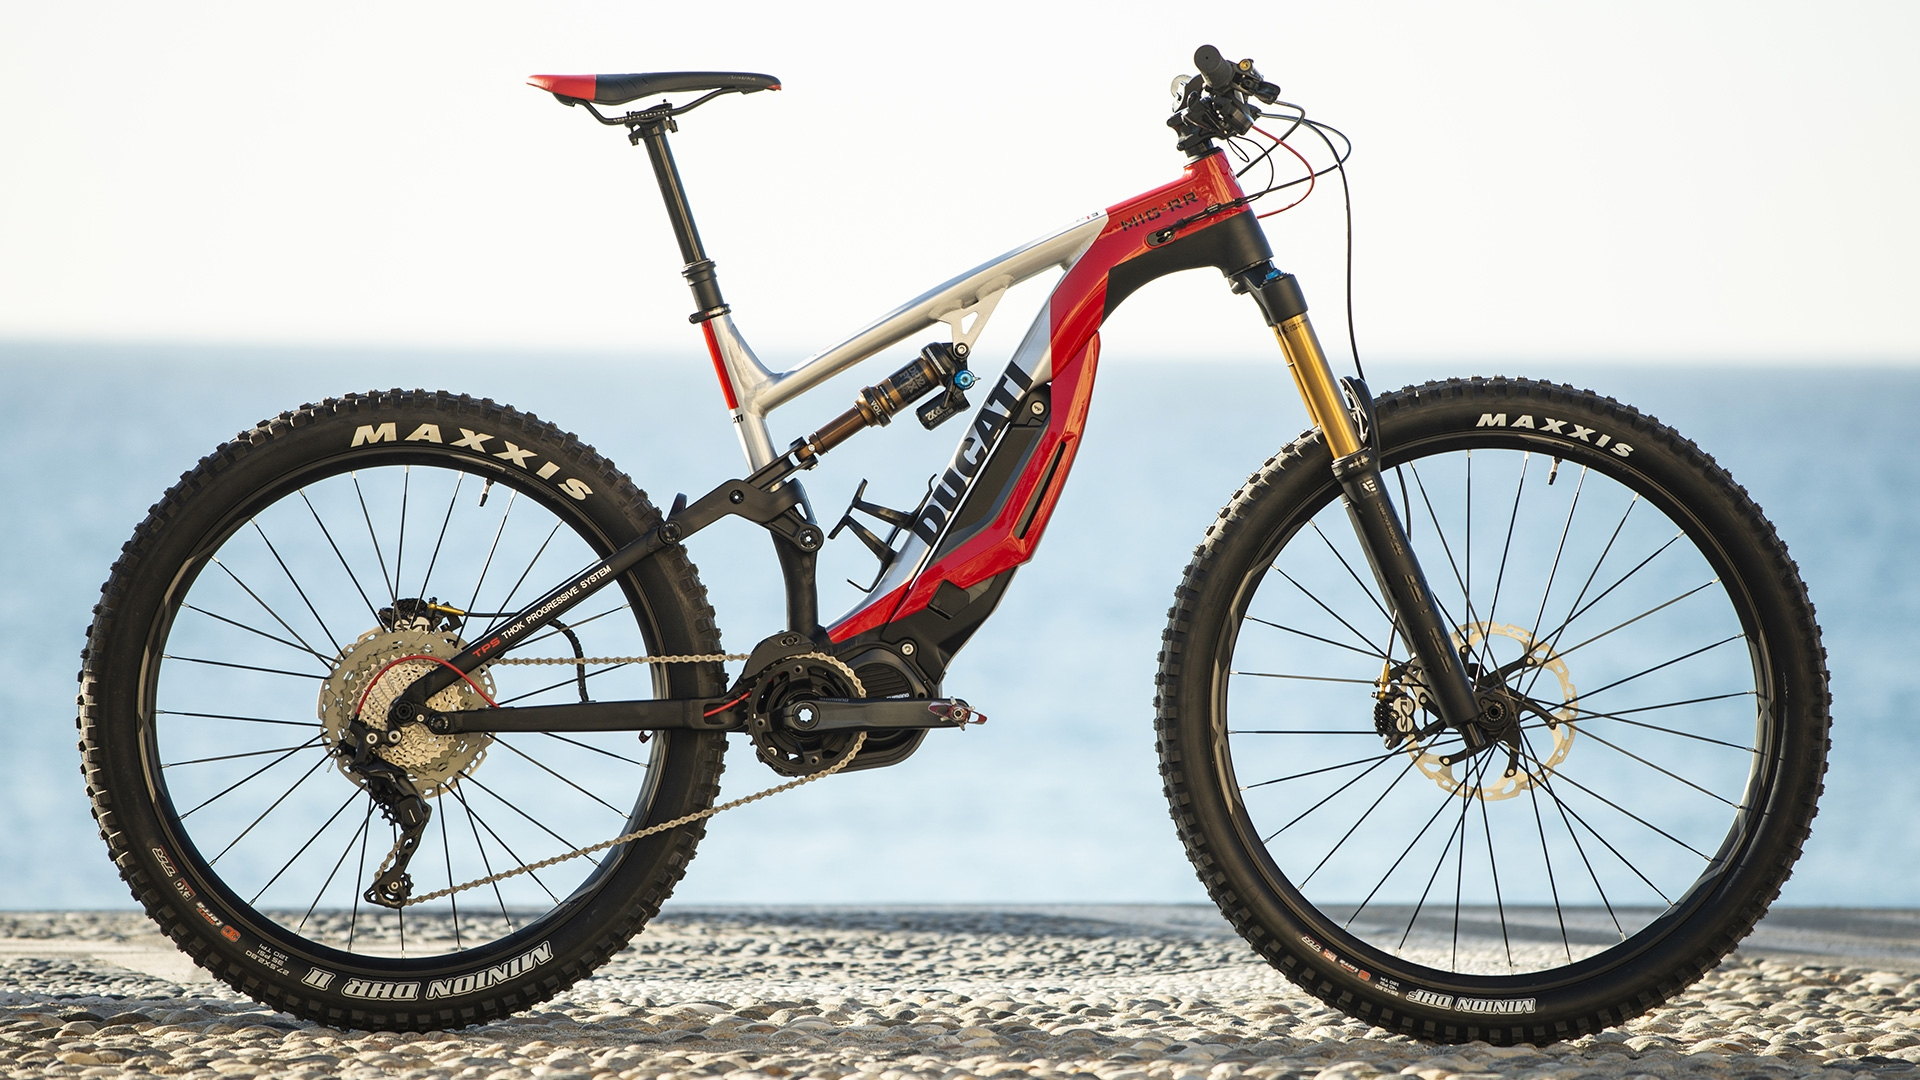 Ducati Mig Rr è In Arrivo La Mountain Bike A Pedalata Assistita